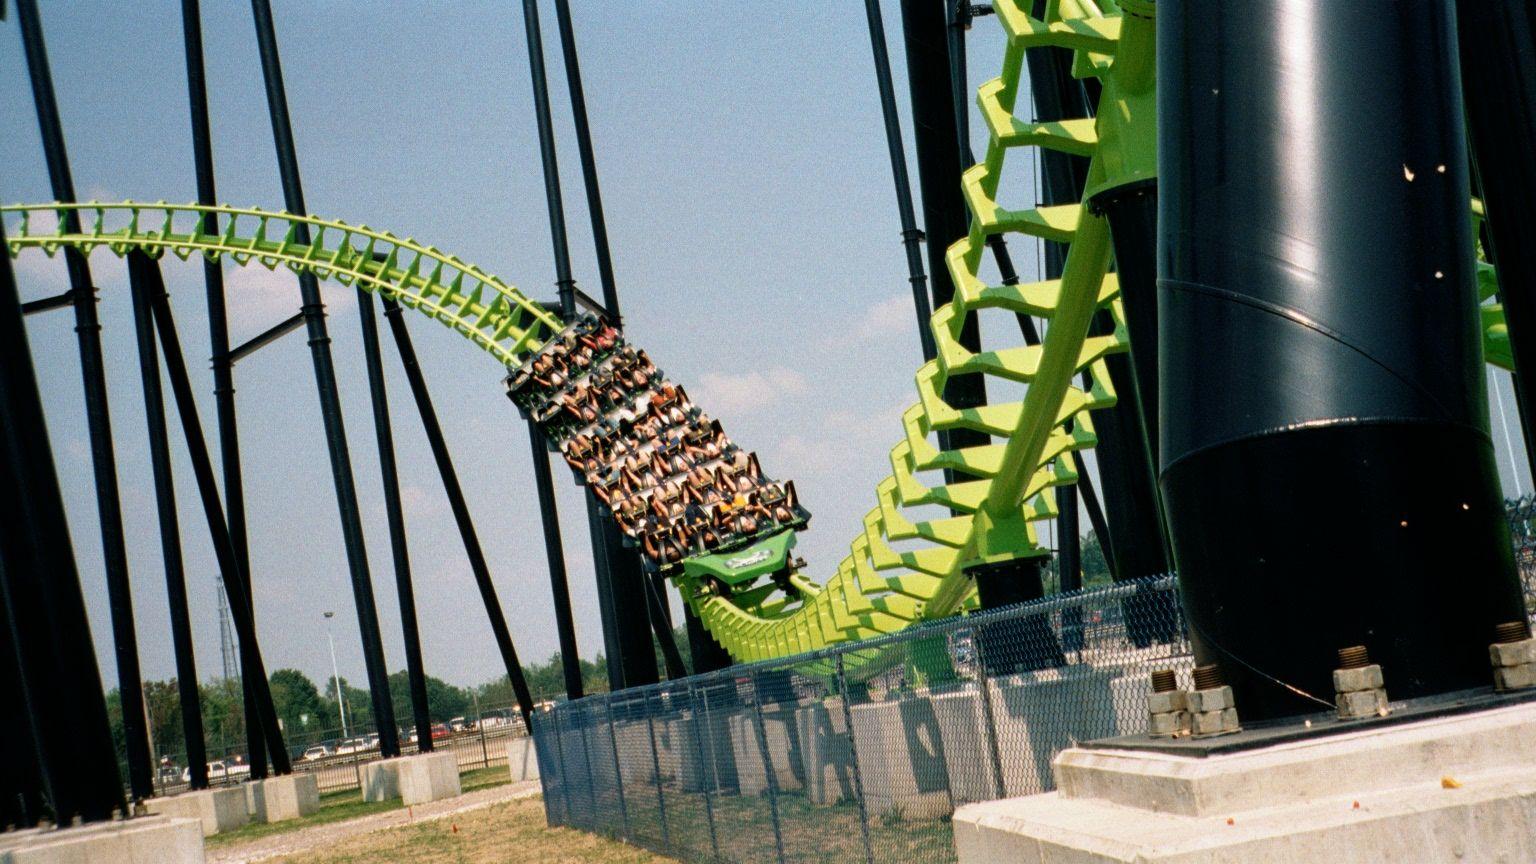 X Flight At The Defunct Six Flags Worlds Of Wonder Aka Geauga Lake Roller Coaster Lake Northeast Ohio